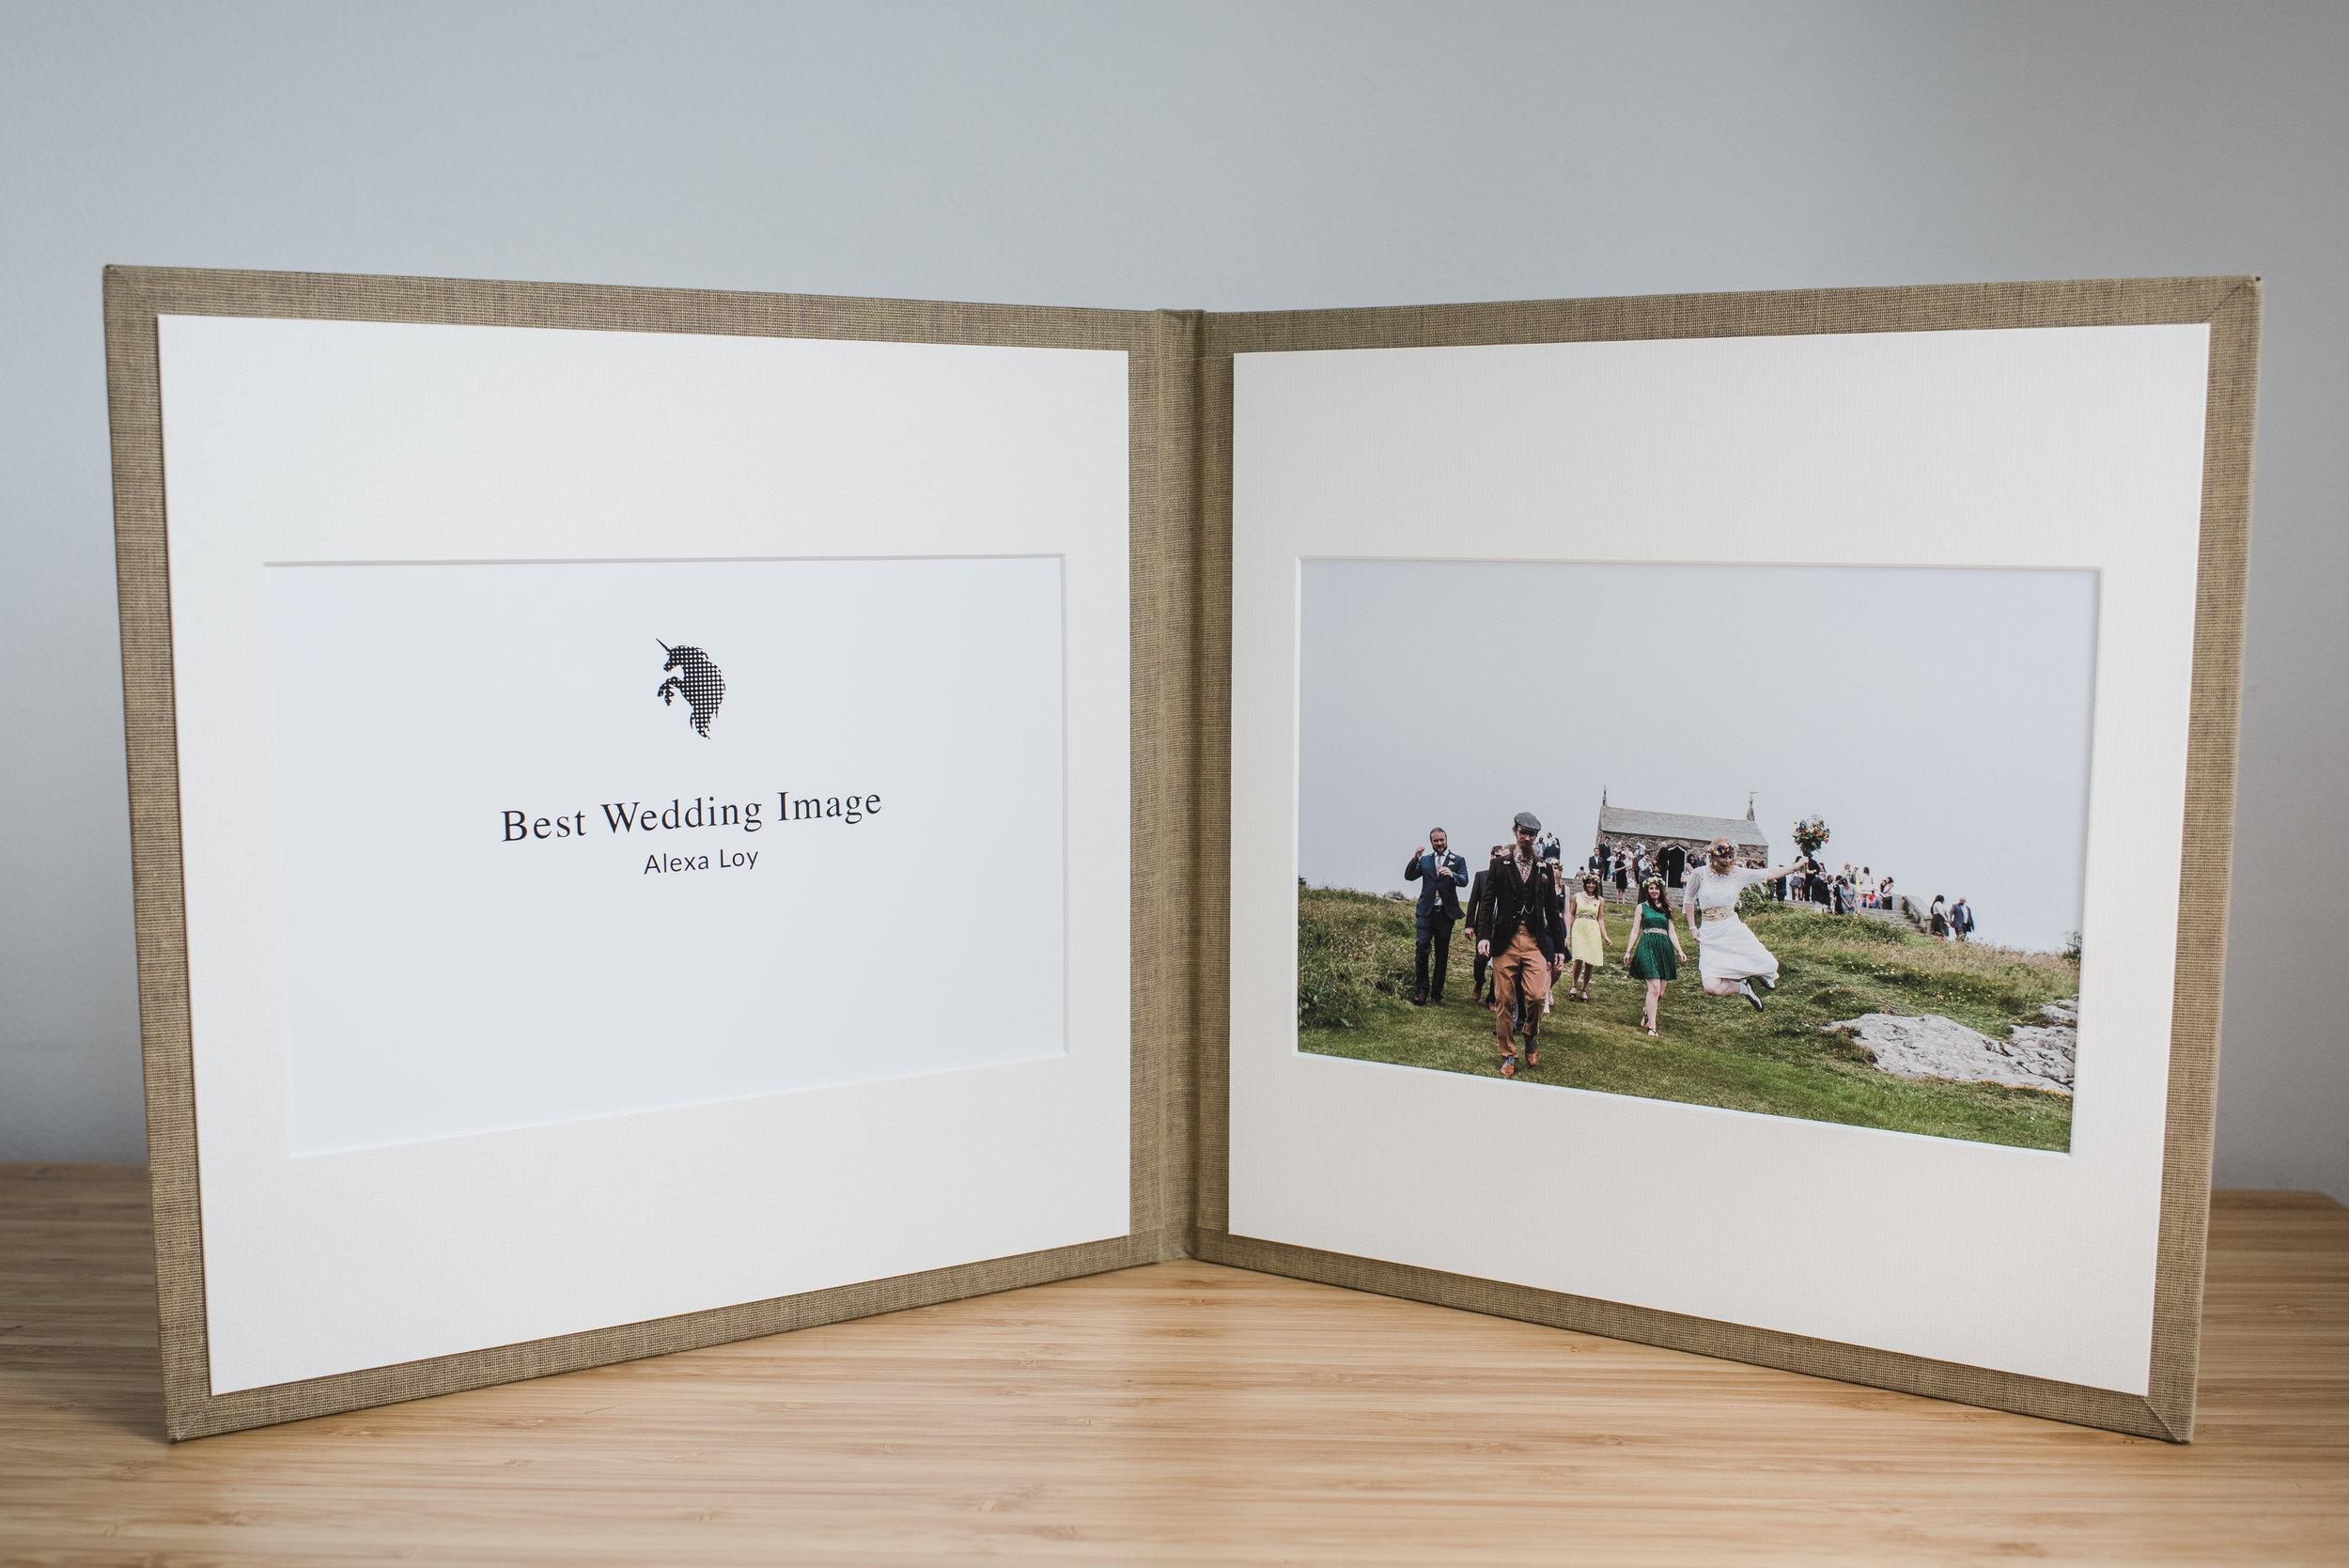 Photography Farm award, Best Wedding Image, 2016